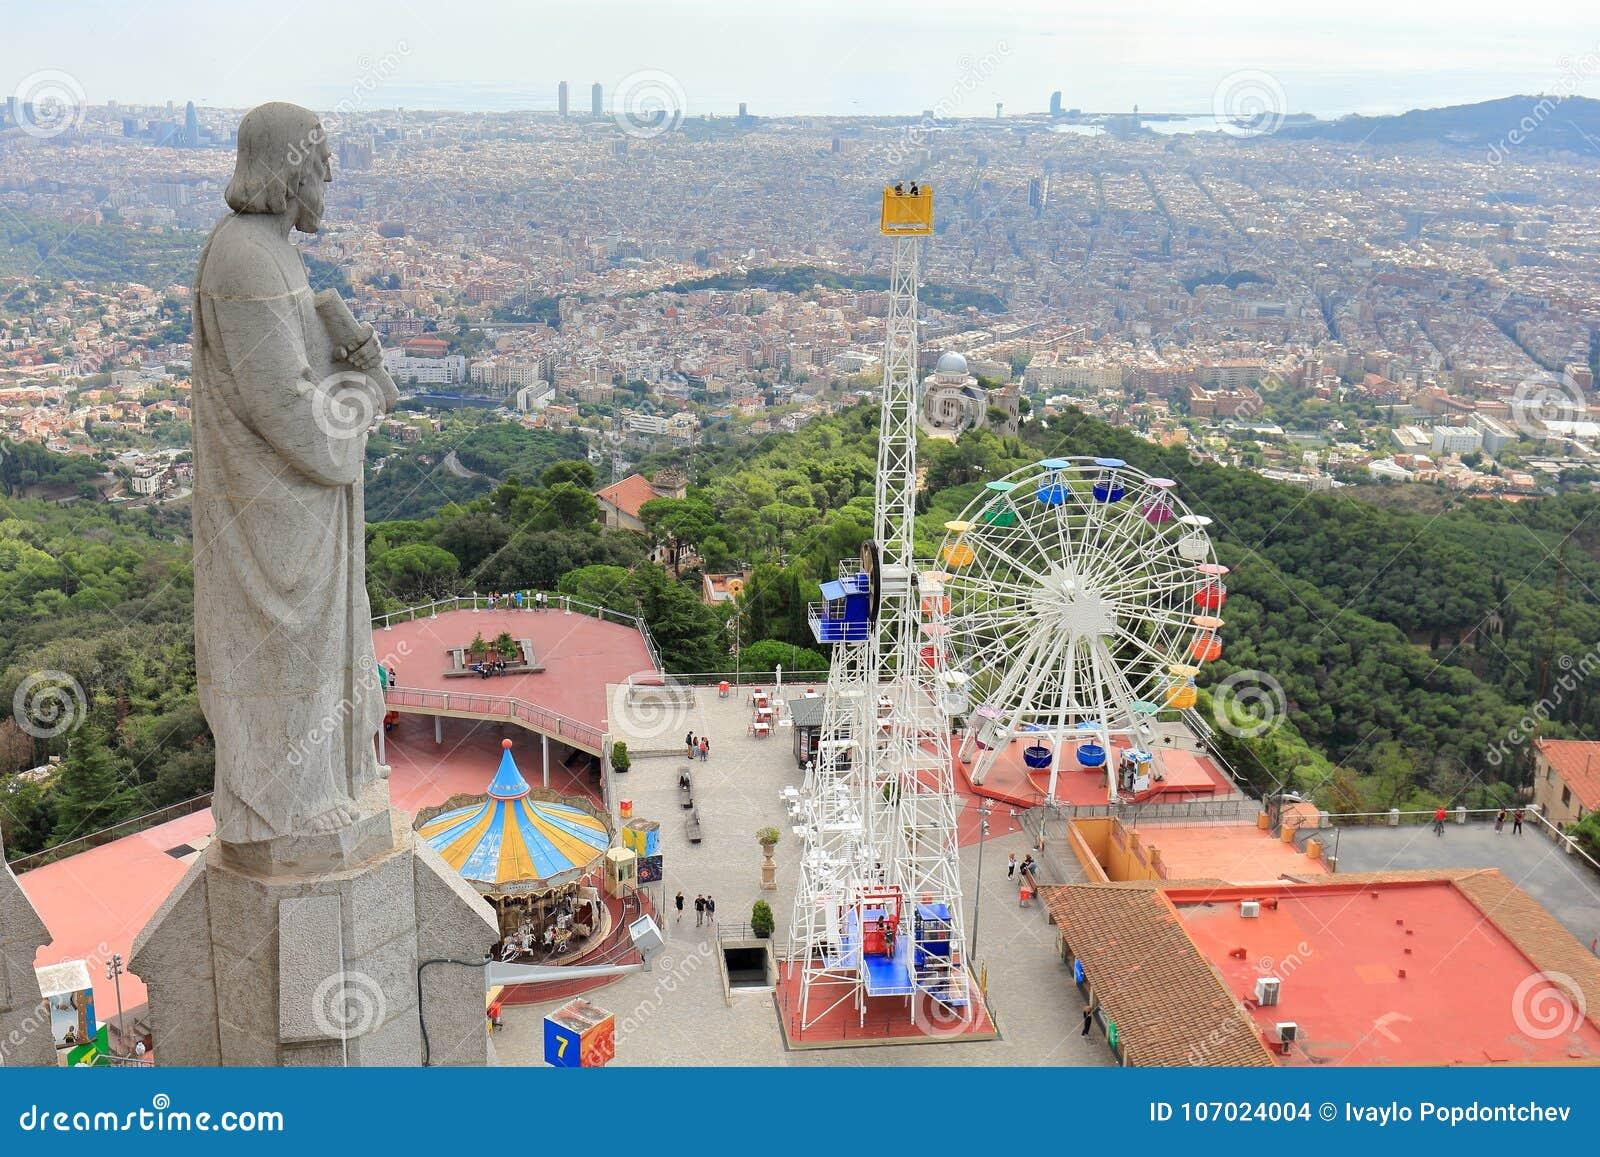 Tibidabo Amusement Park And The City Of Barcelona Seen From Sagrat Cor Church Barcelona Catalonia Spain Stock Photo Image Of Europe Mountain 107024004